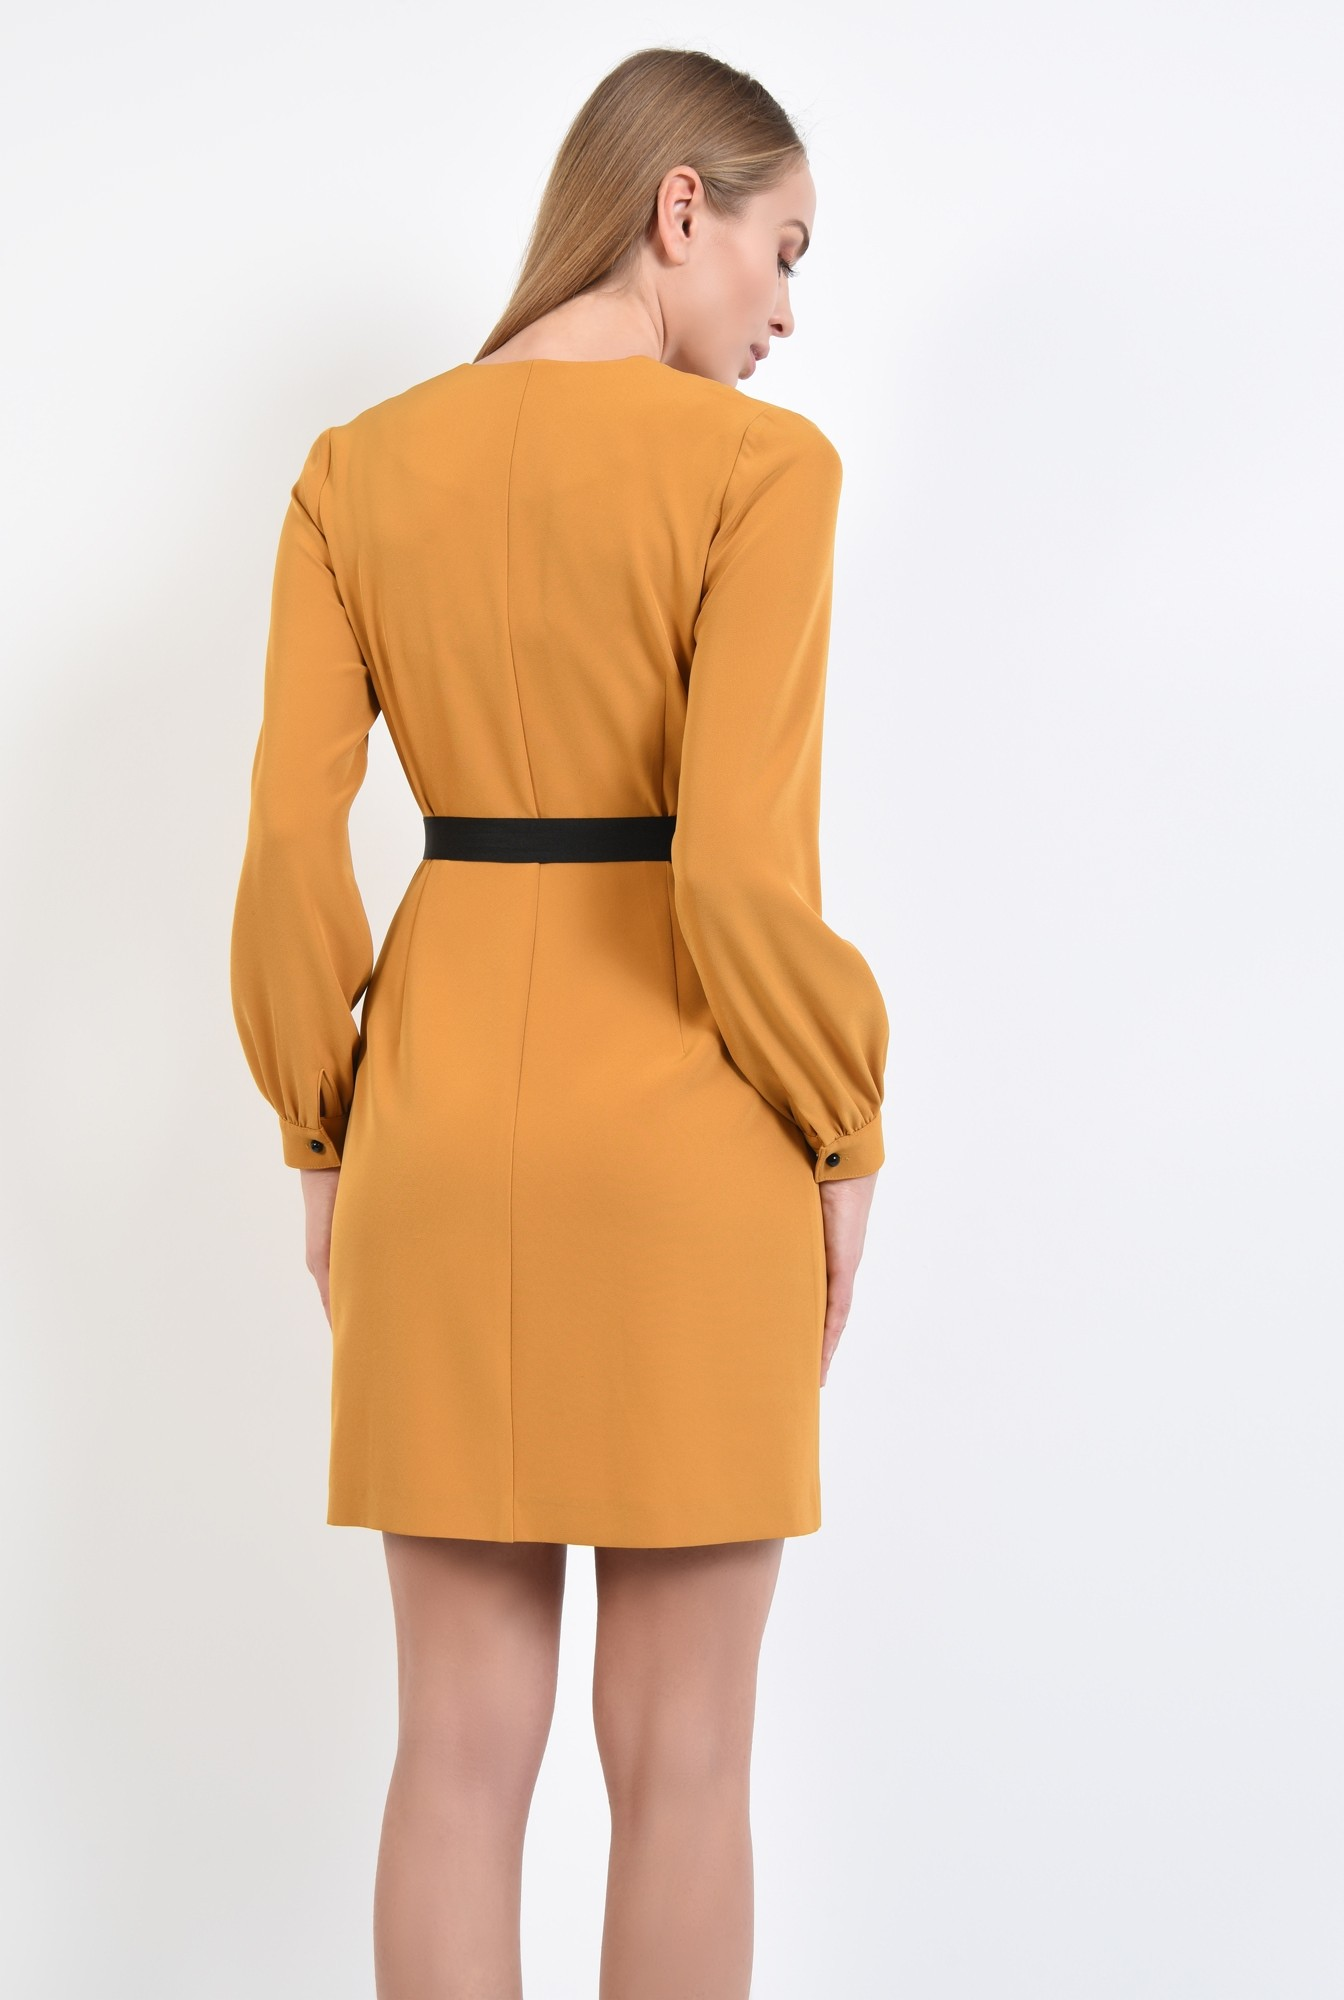 1 - rochie mustar, anchior petrecut, maneci lungi cu manseta, croi parte peste parte